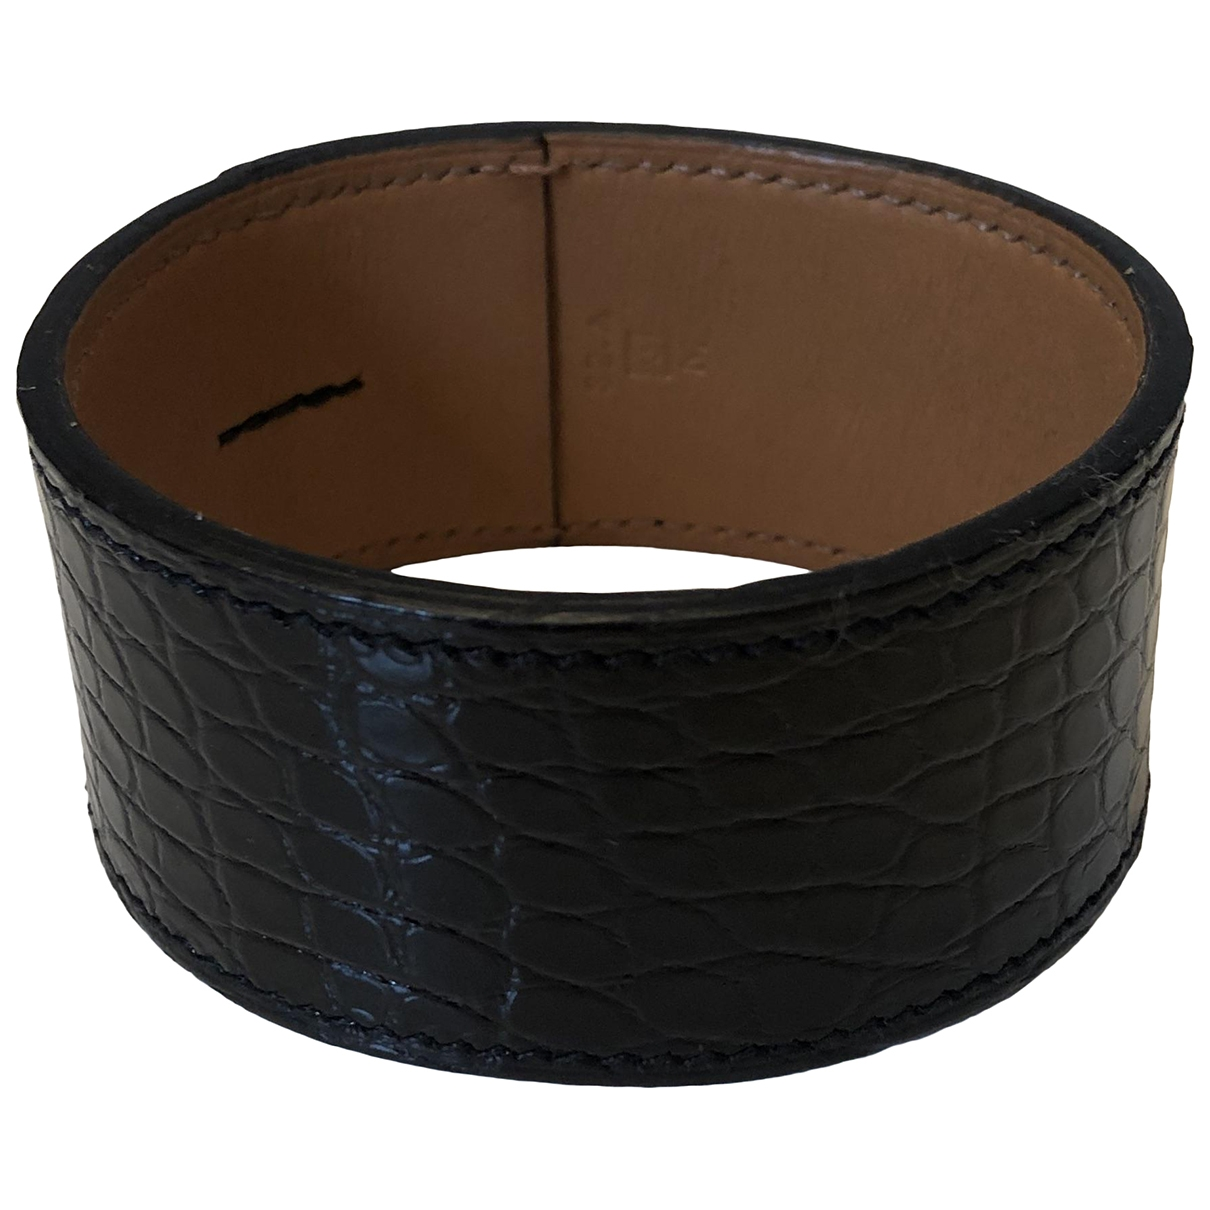 Hermes \N Armband in  Schwarz Leder